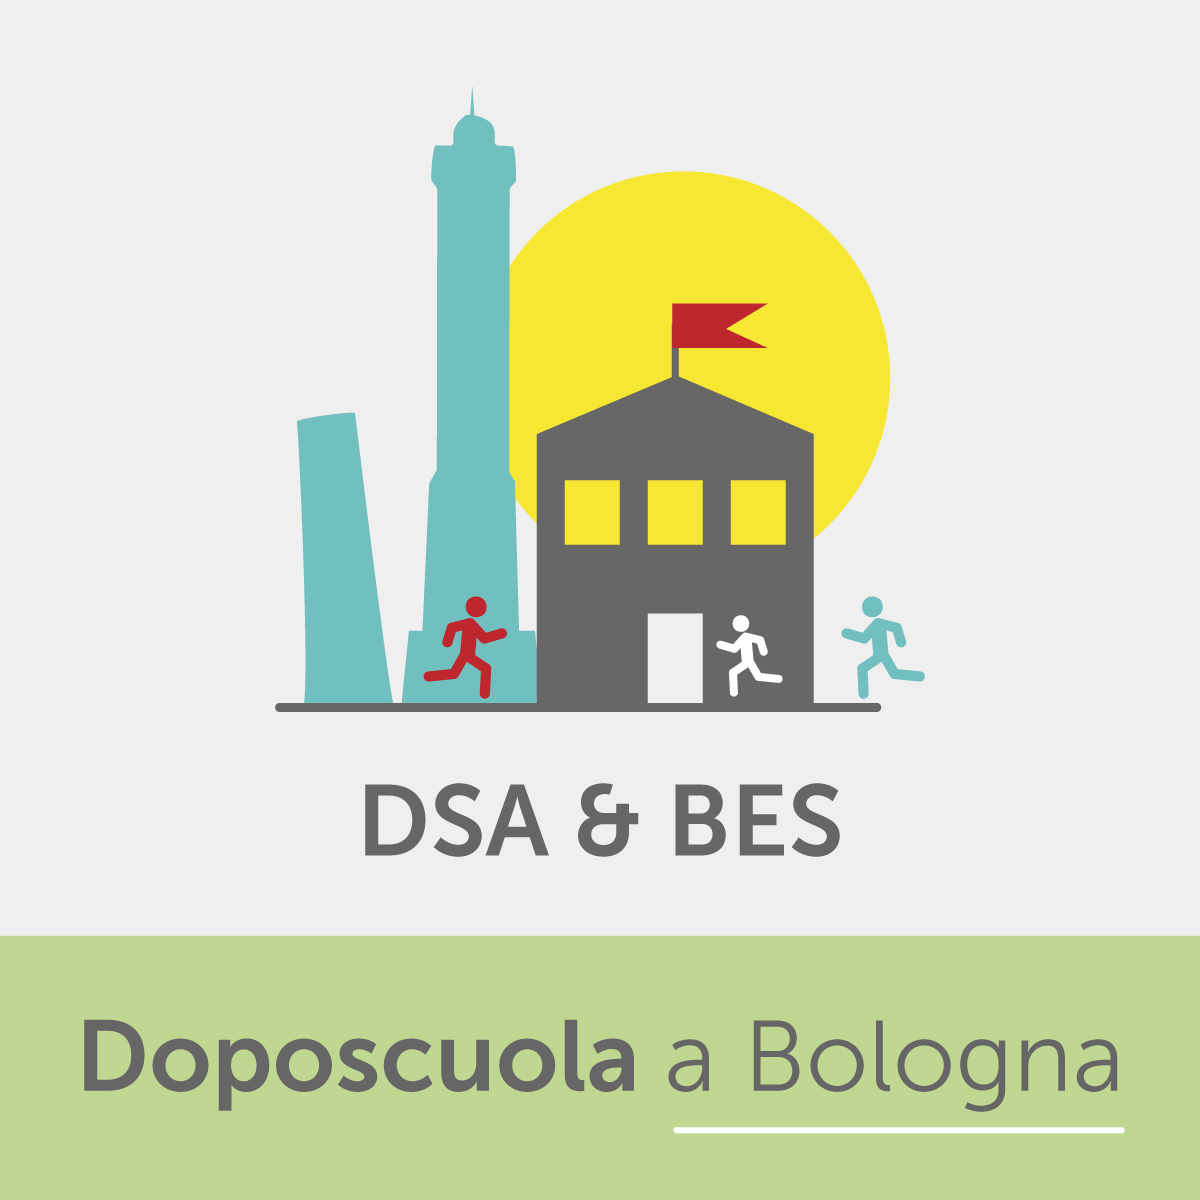 Doposcuola DSA e BES